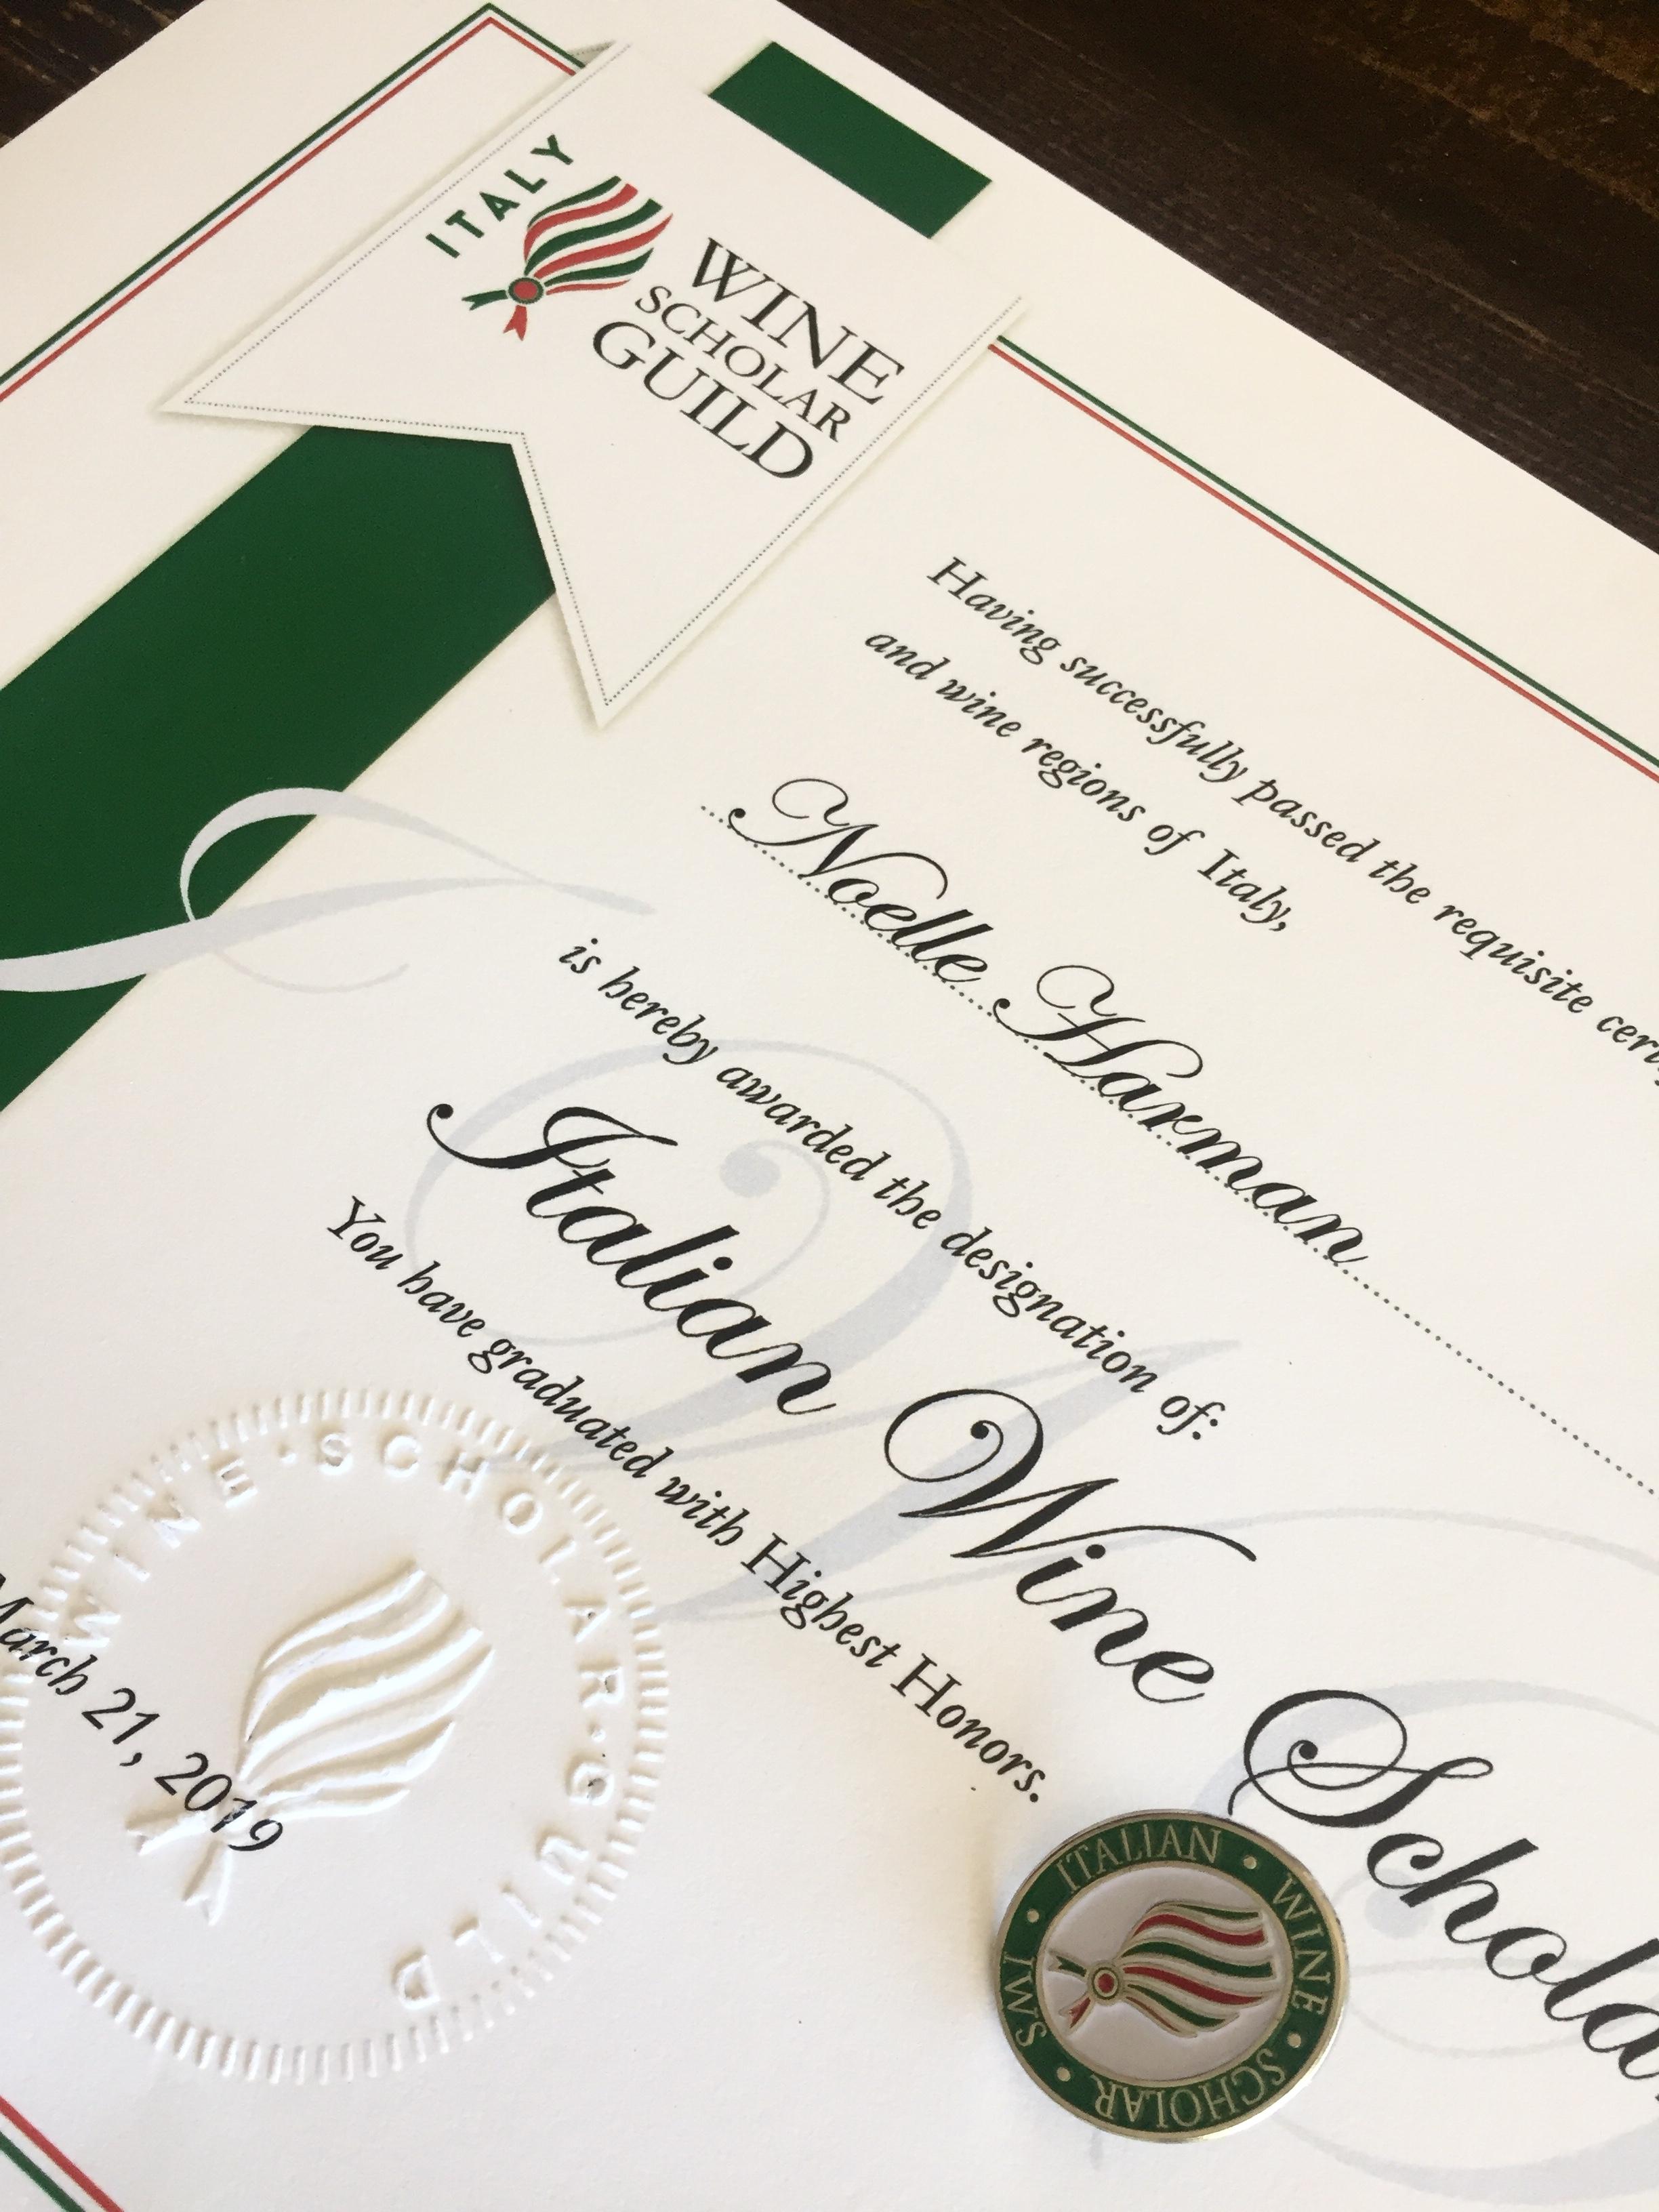 IWS certificate